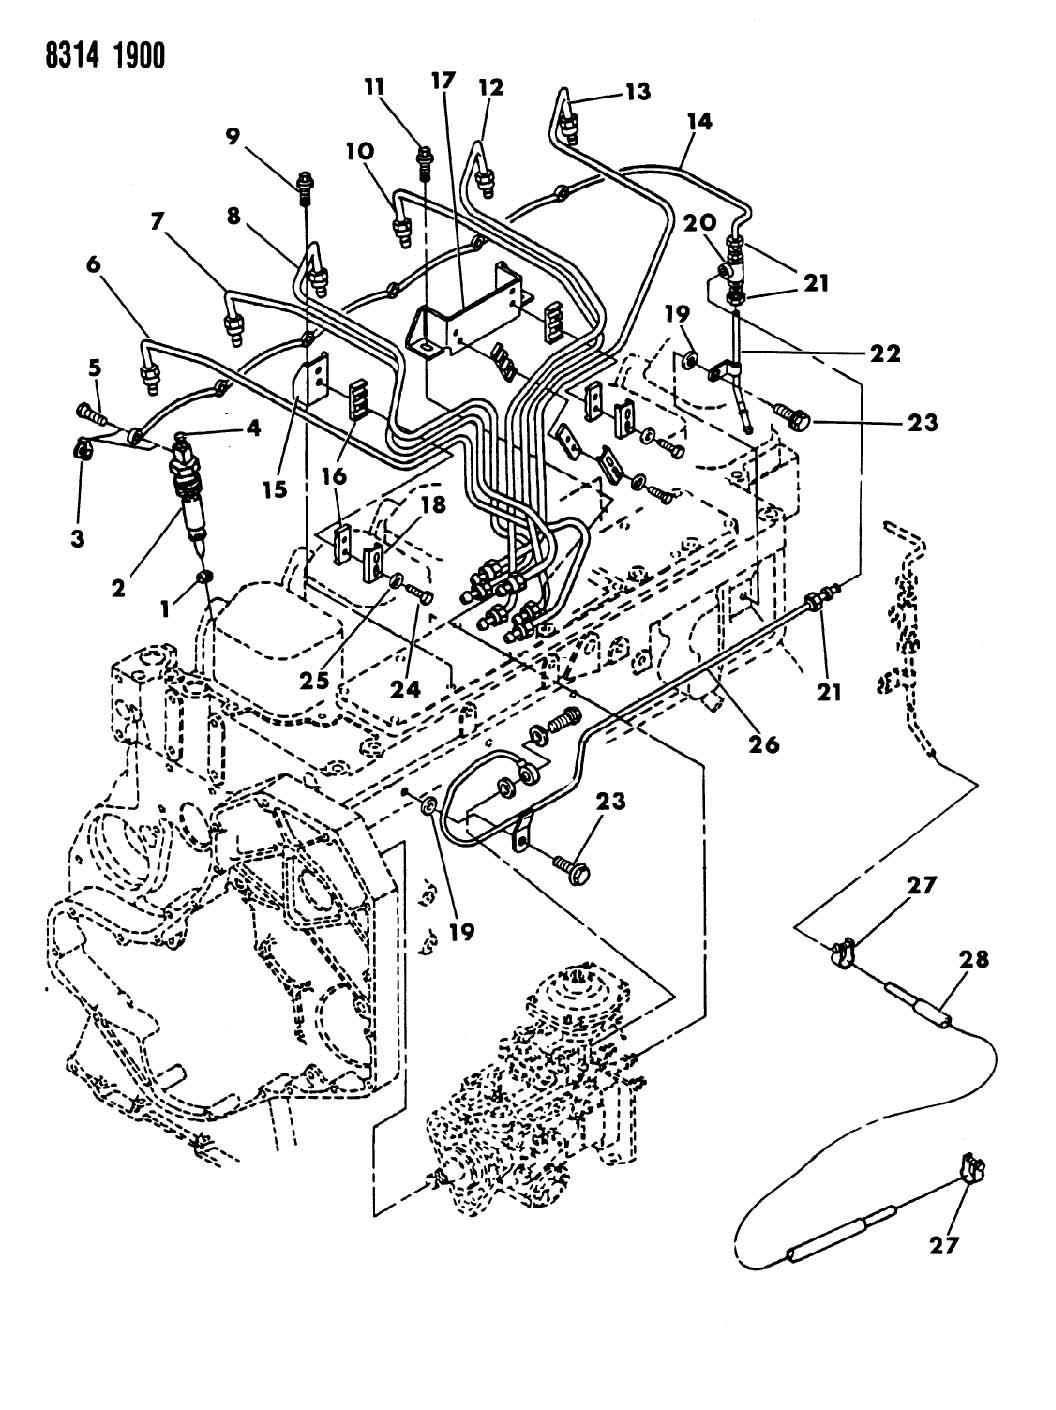 Perfect Jeep Cj7 Fuse Box Diagram Vignette - Electrical Diagram ...